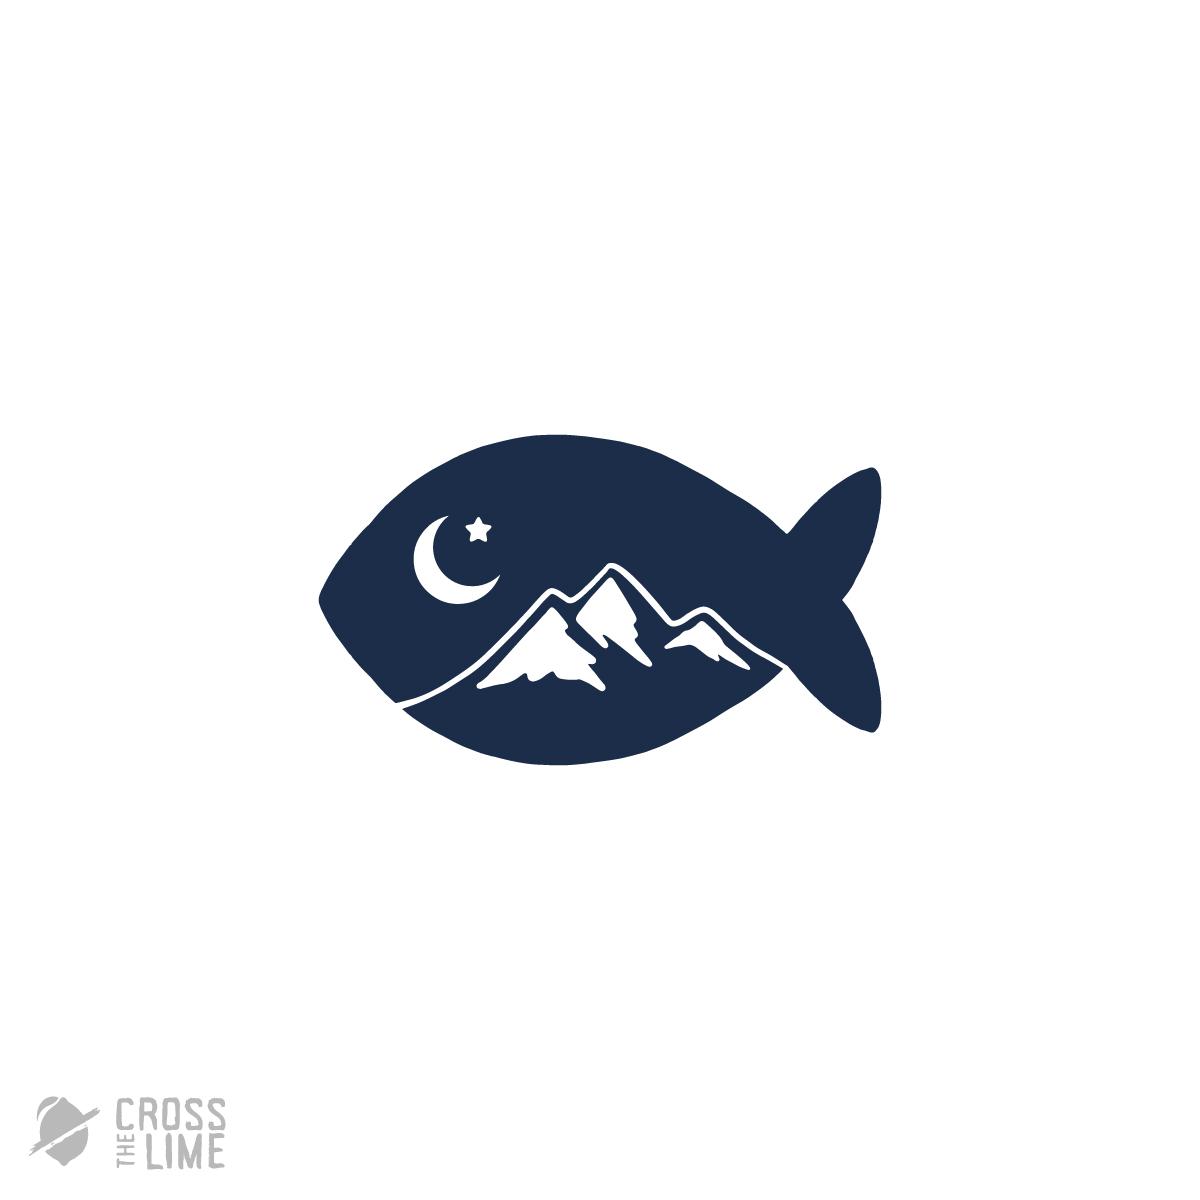 Moon fish logo